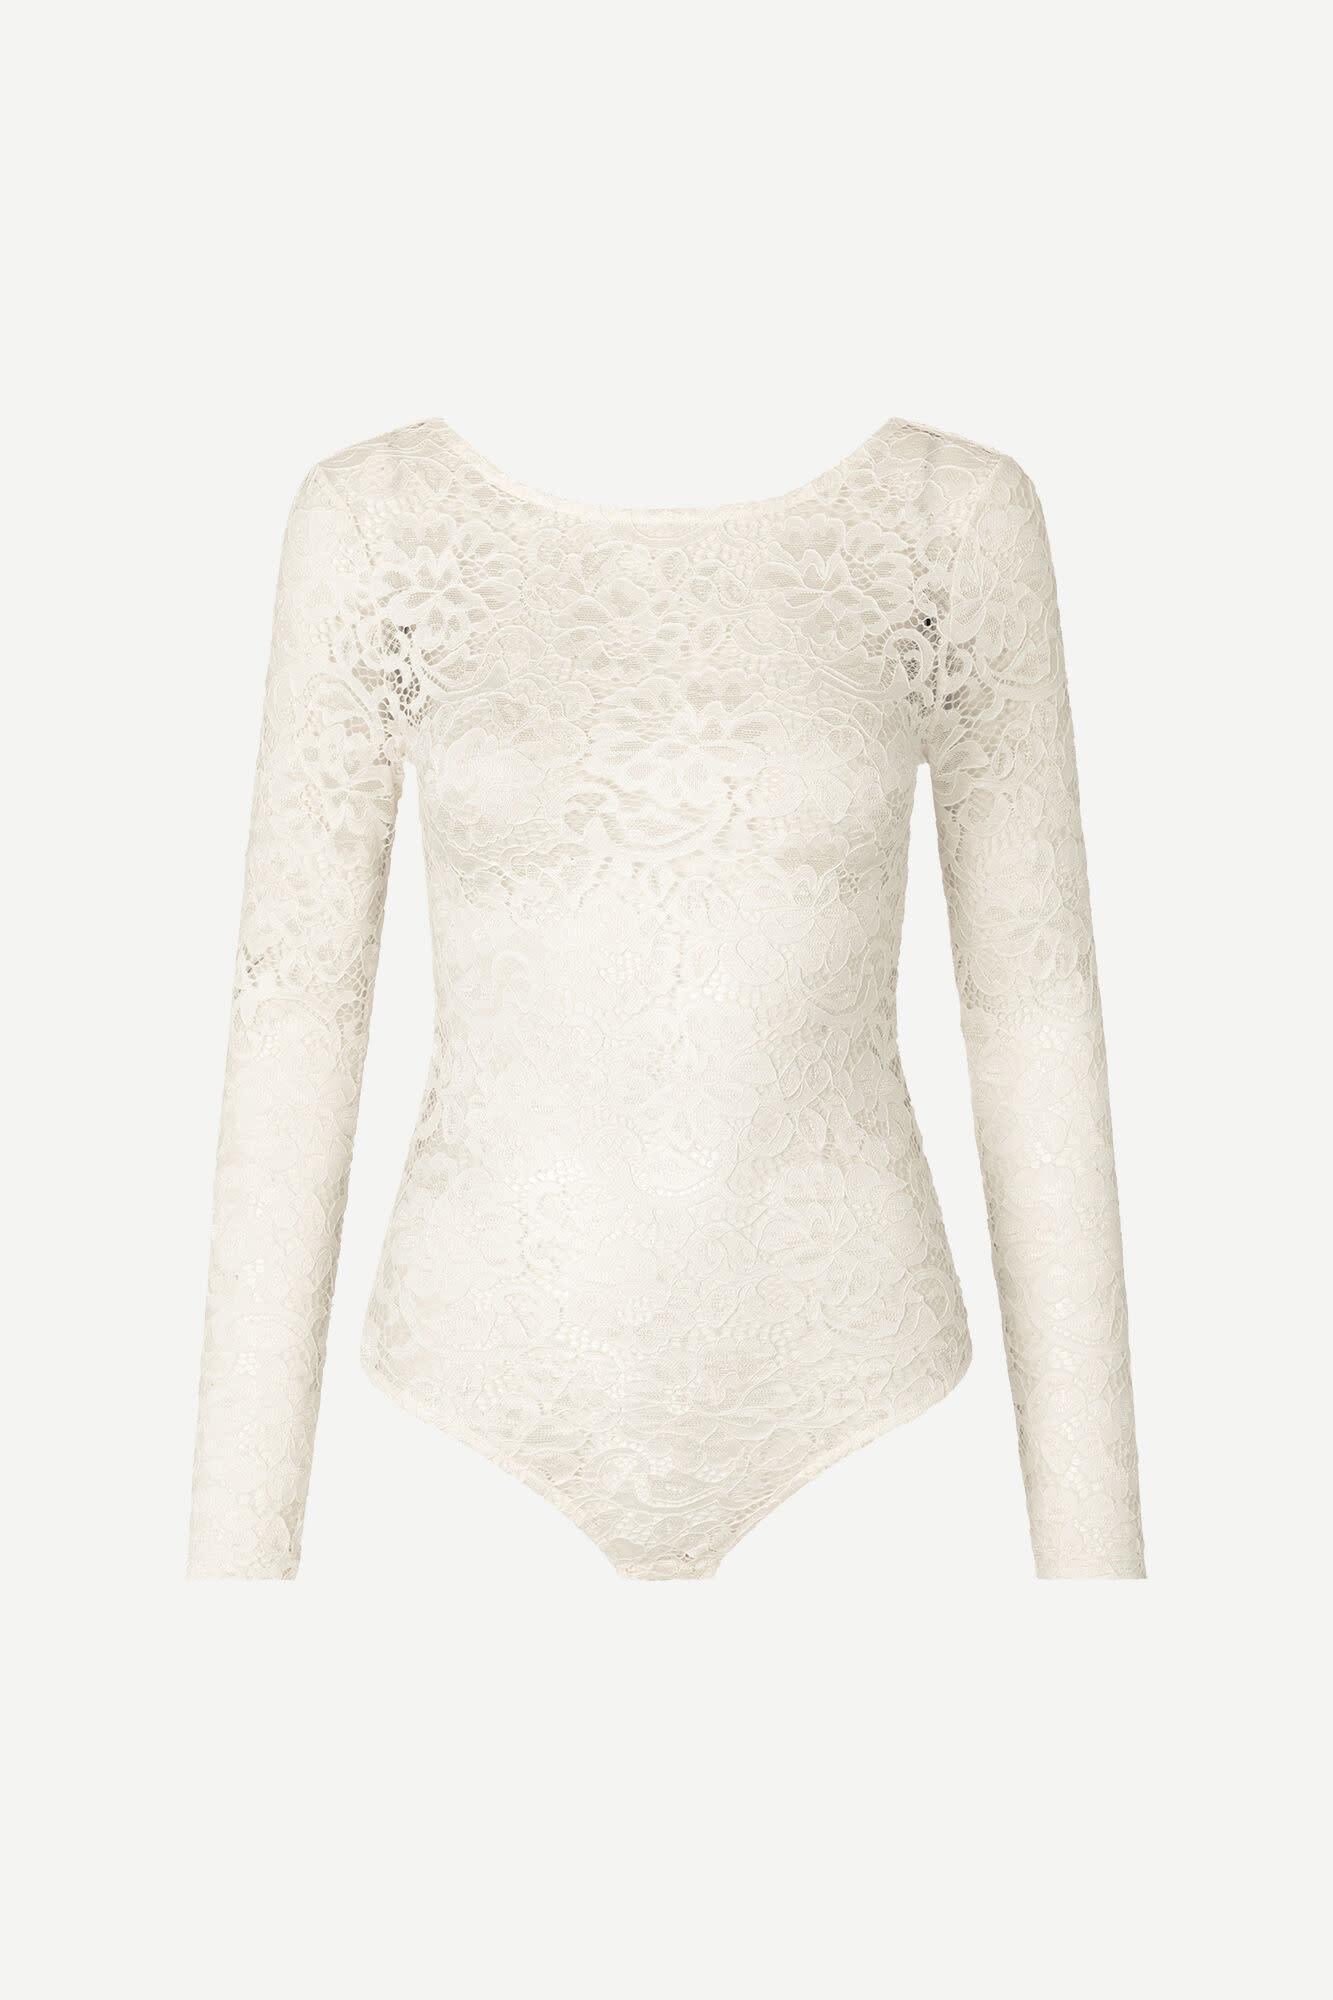 Maalika Lace Body Stocking Ecru White-2